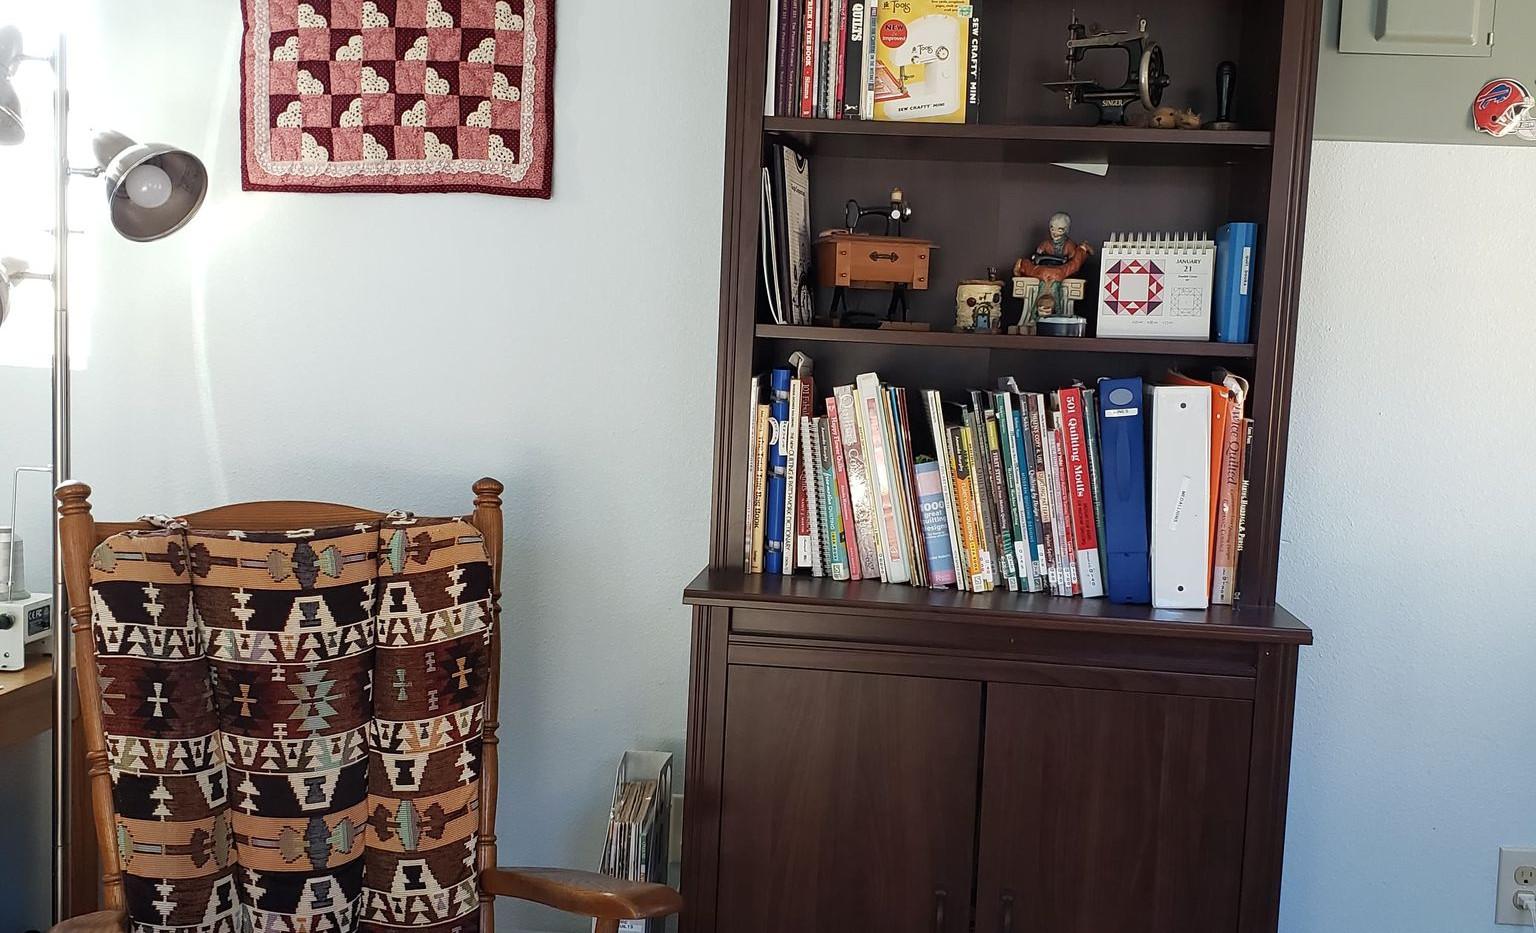 Inside Sewing Cabin